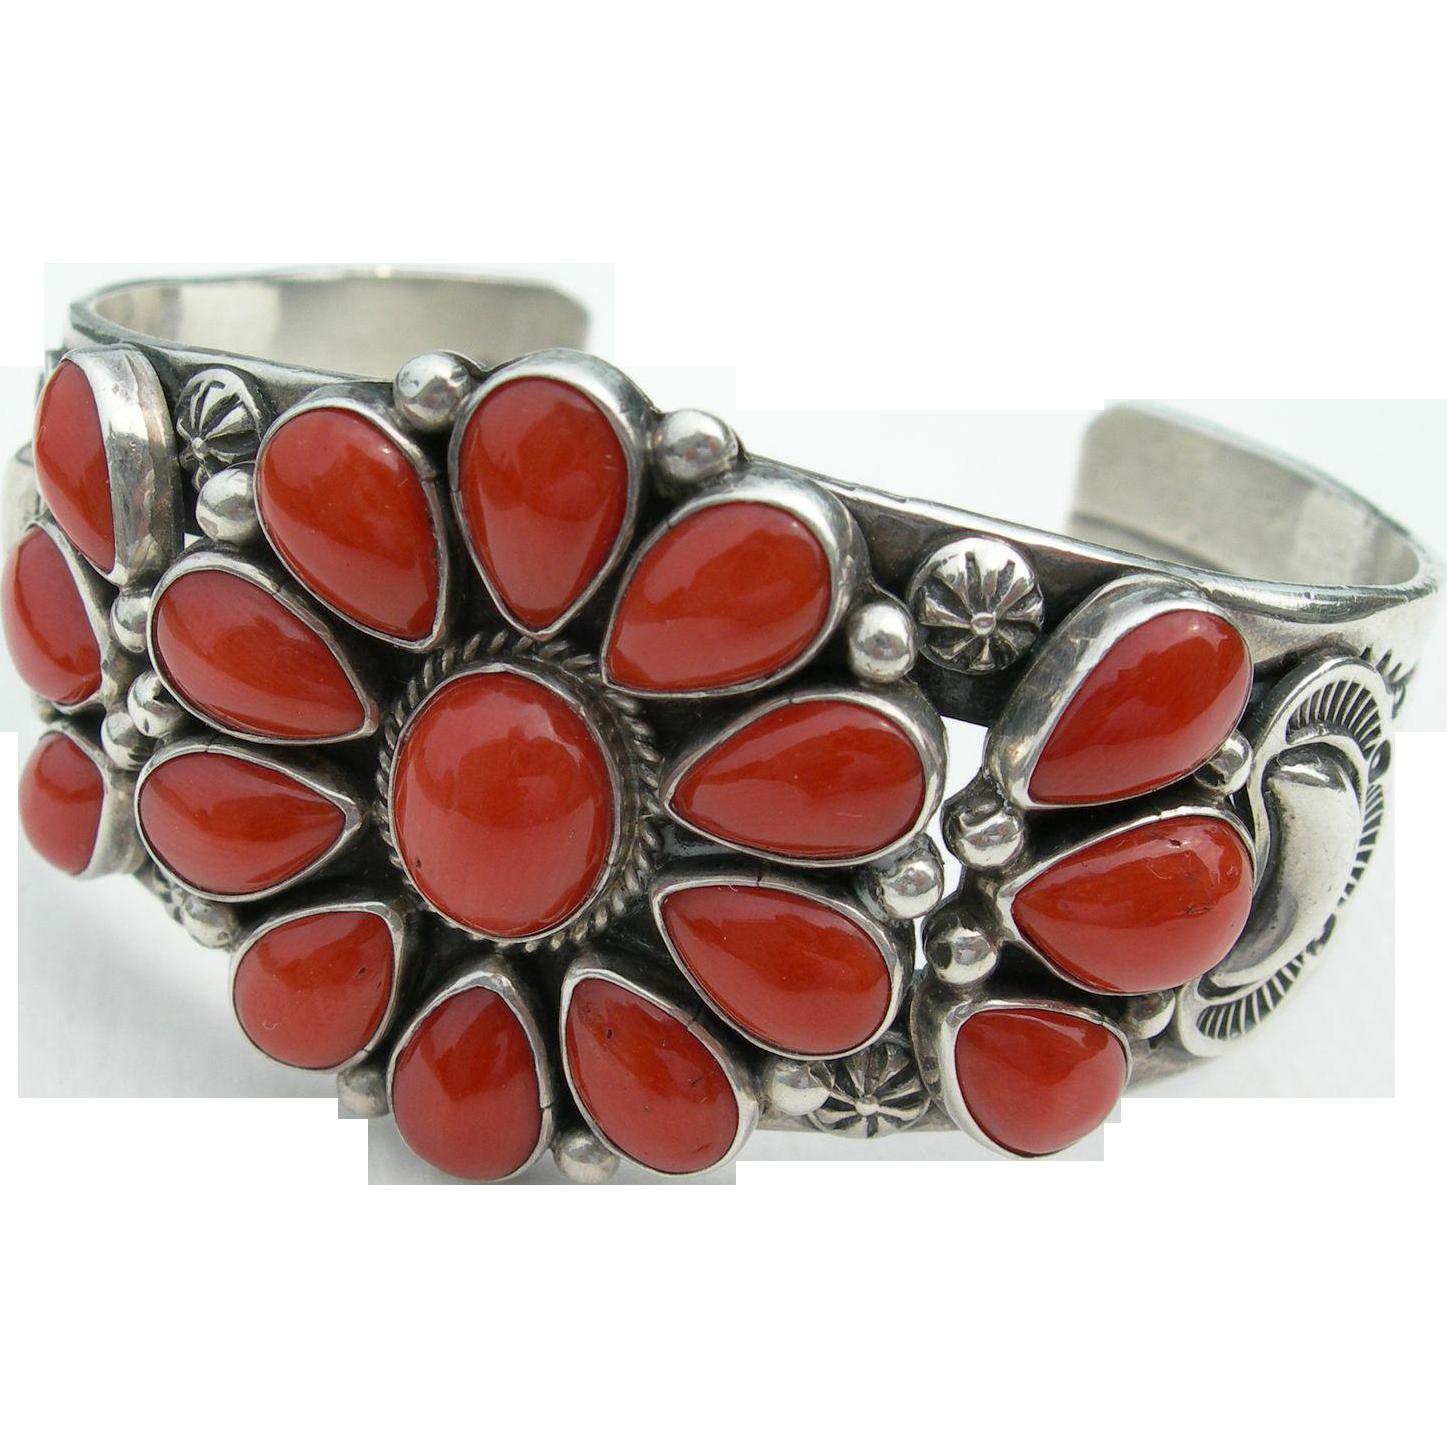 Delbert Gordon - Sterling Silver - Red Coral - Cuff Bracelet